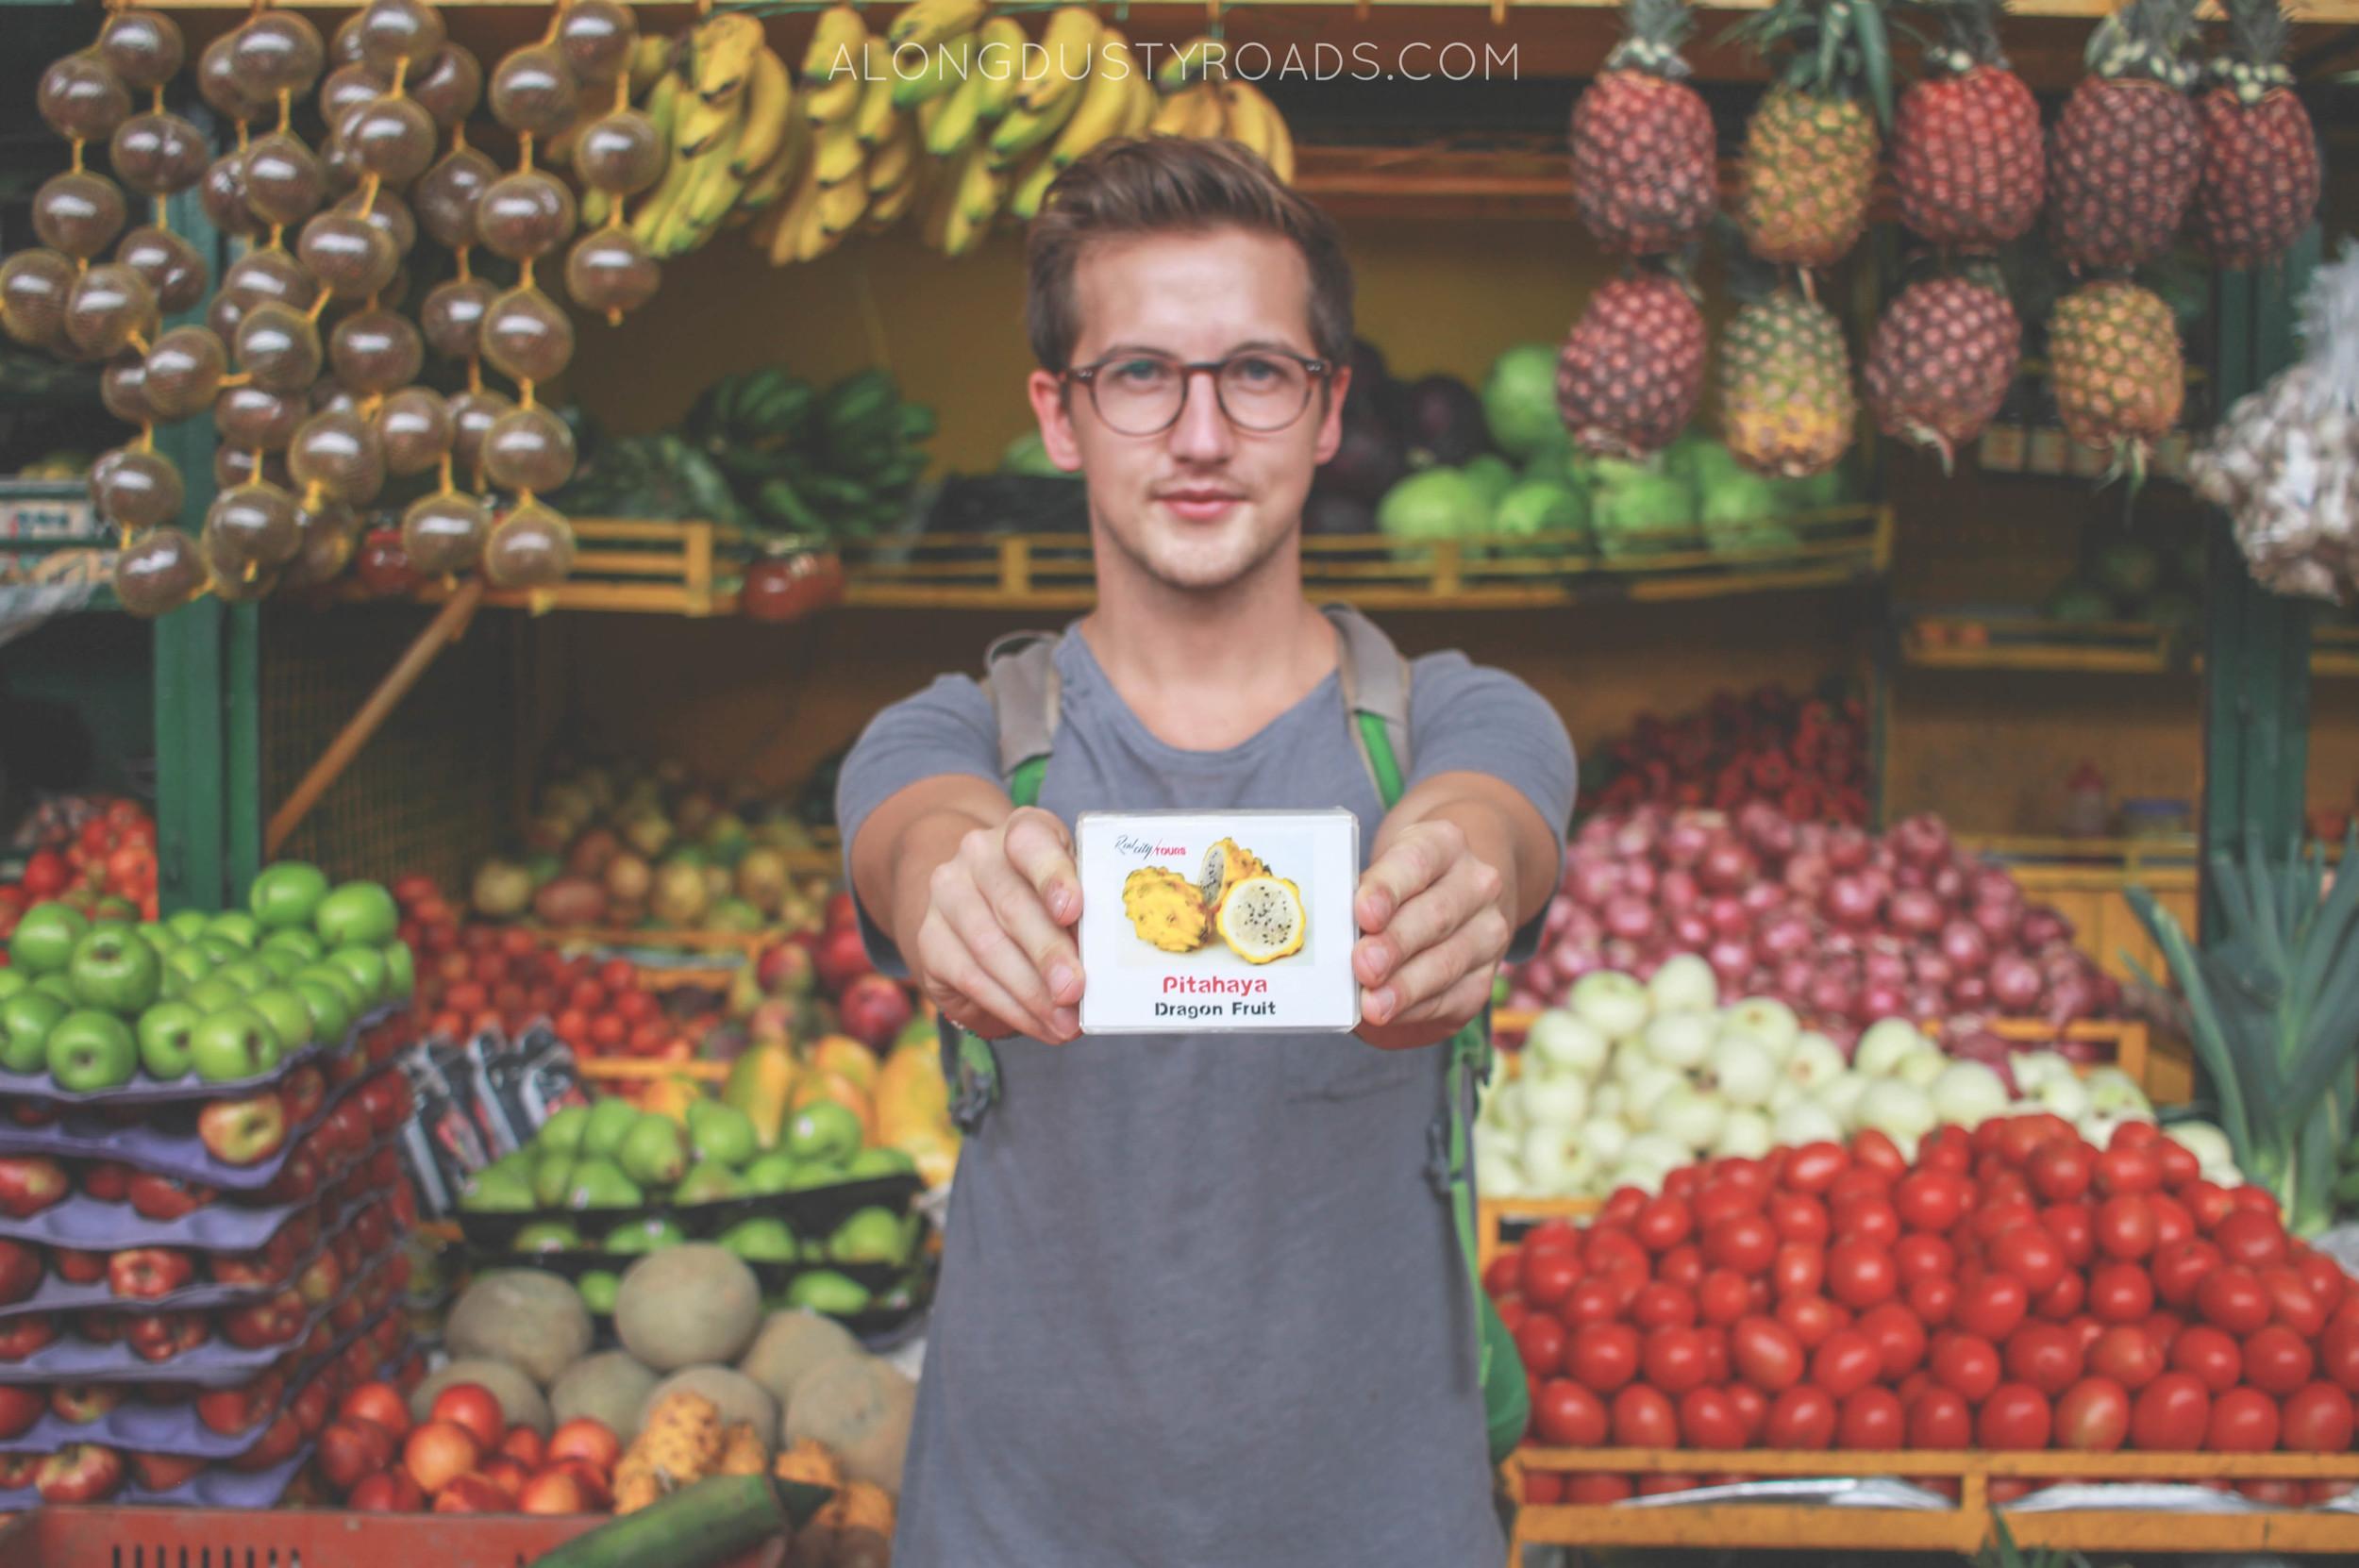 pithaya minorista market exotic fruit tour